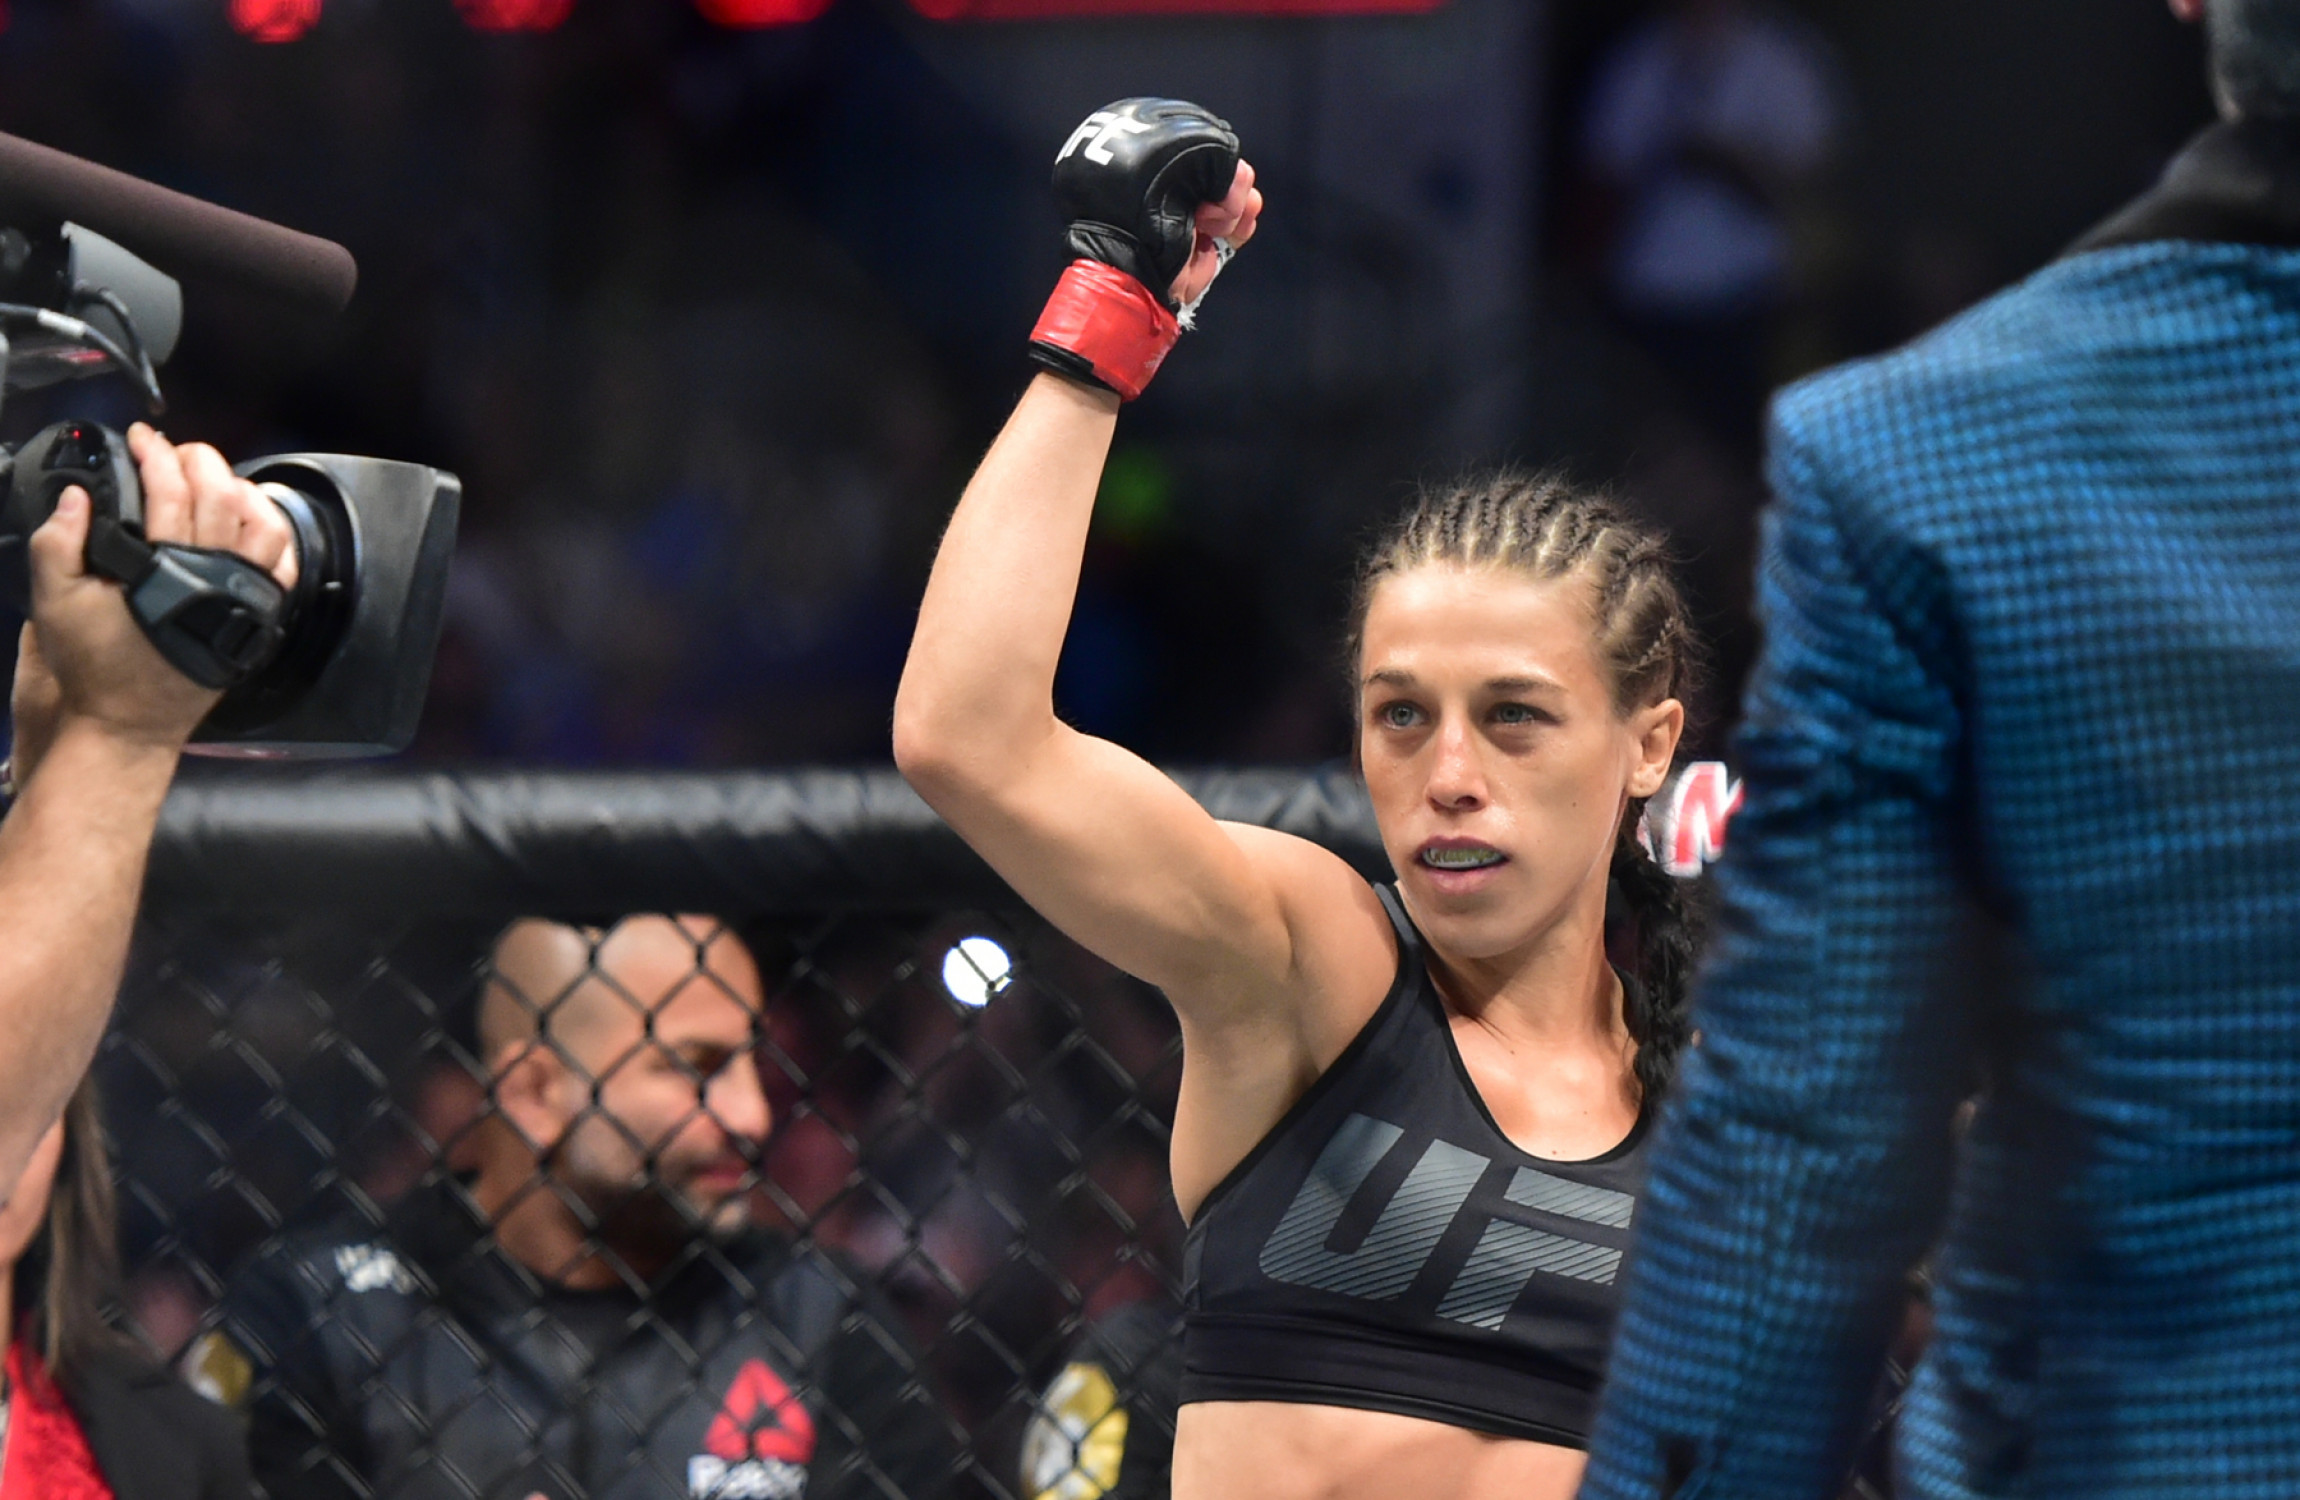 UFC 217 Gets Third Title Fight In Joanna Jedrzejczyk vs. Rose Namajunas